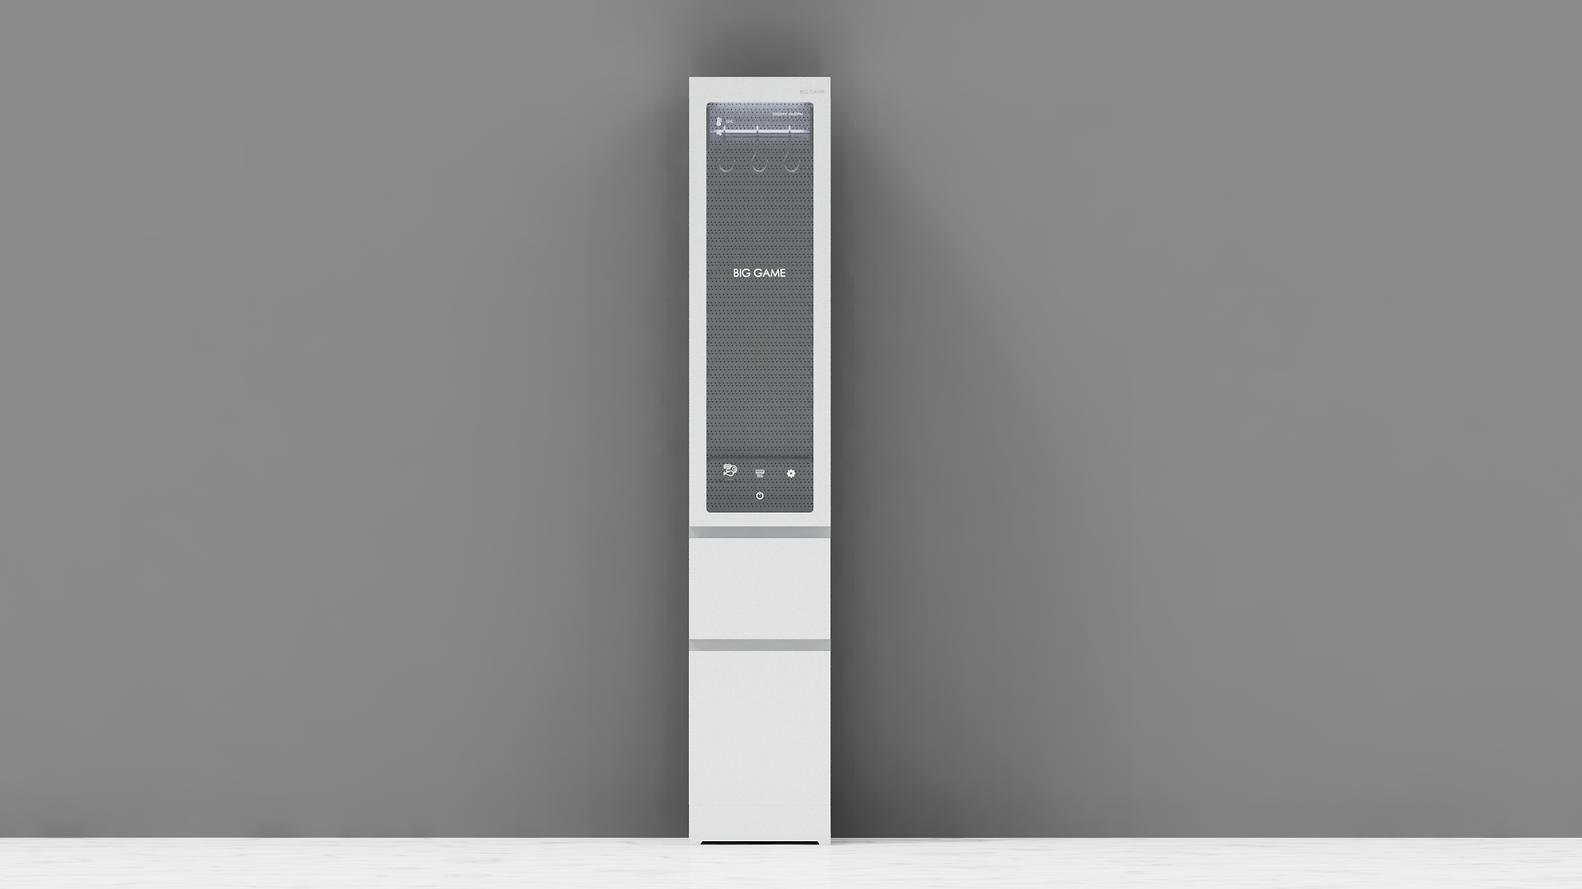 fridge test 2.103.png